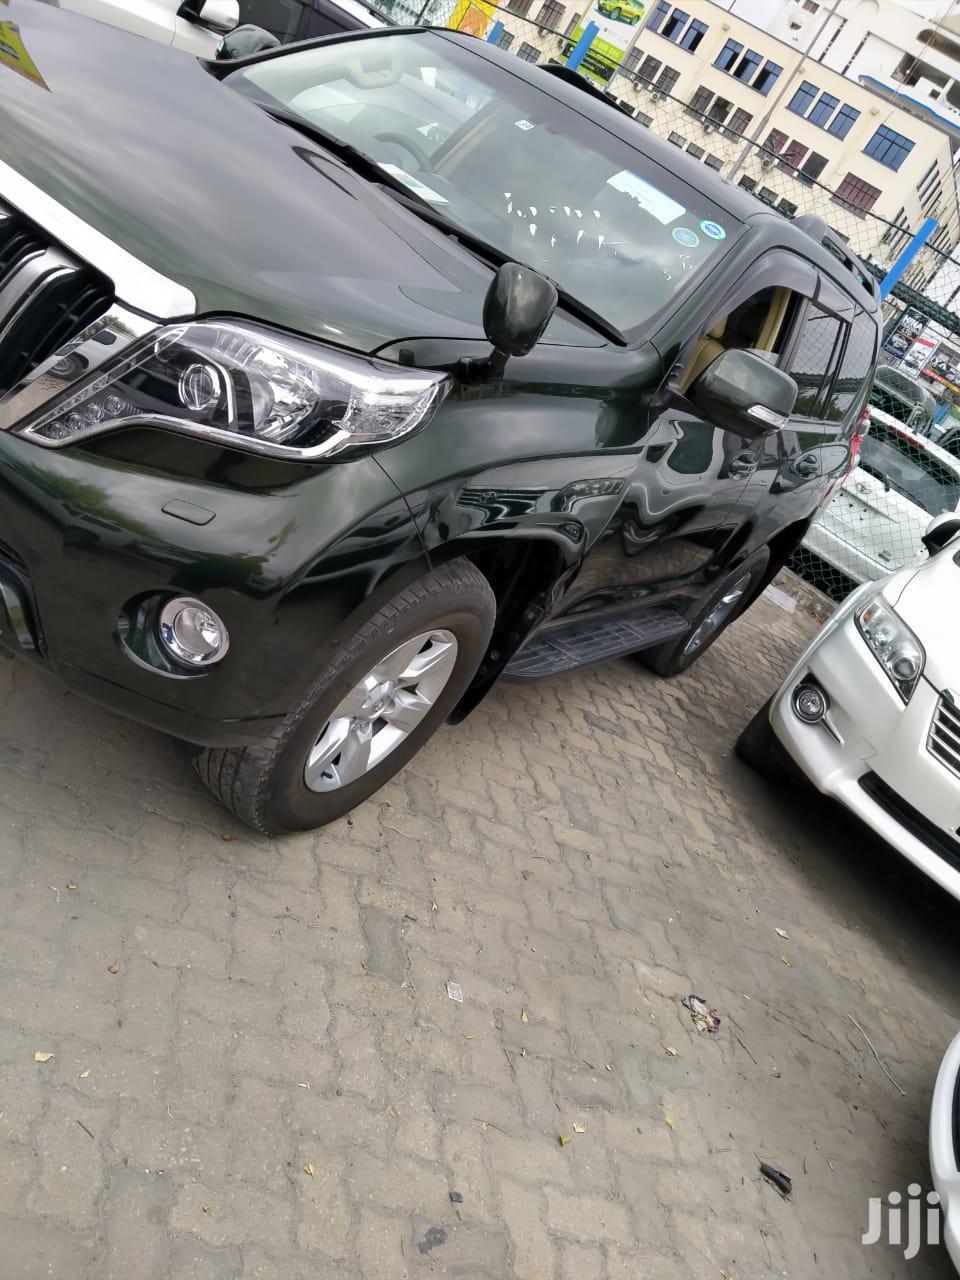 Toyota Land Cruiser Prado 2015 Green | Cars for sale in Mvita, Mombasa, Kenya